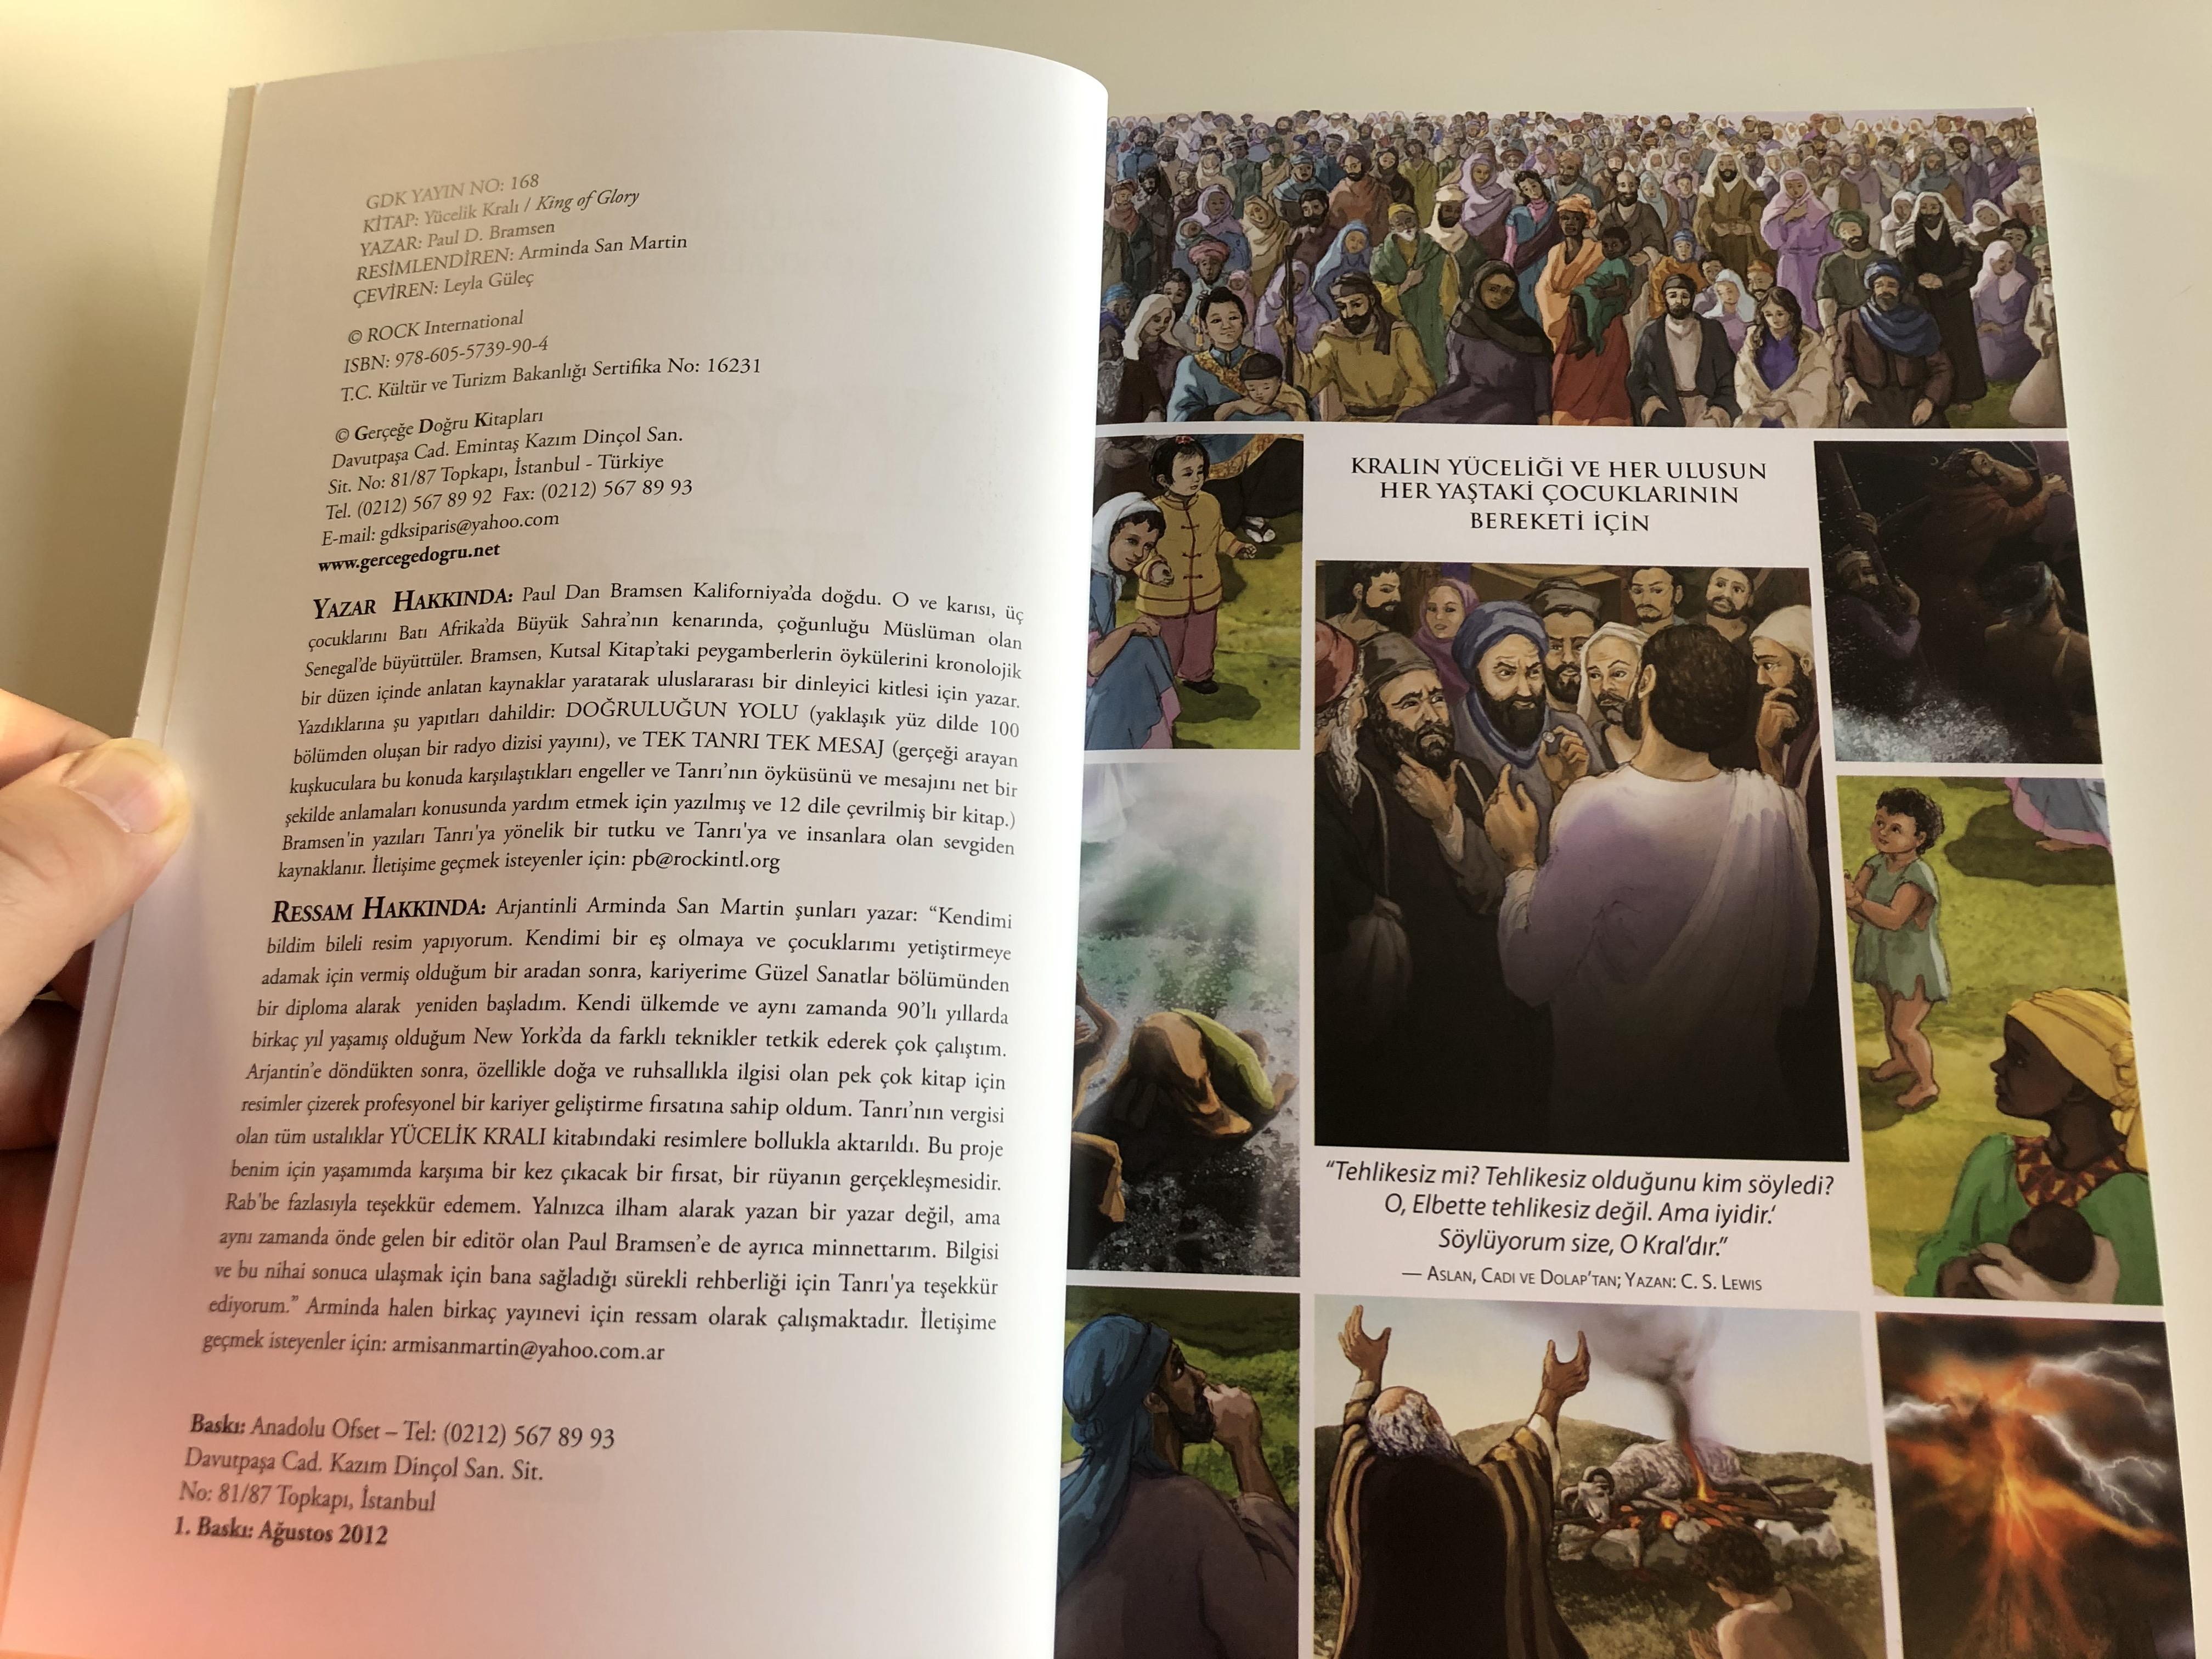 y-celik-krali-king-of-glory-70-bible-stories-for-children-turkish-language-edition-by-p.-d.-bramsen-3.jpg